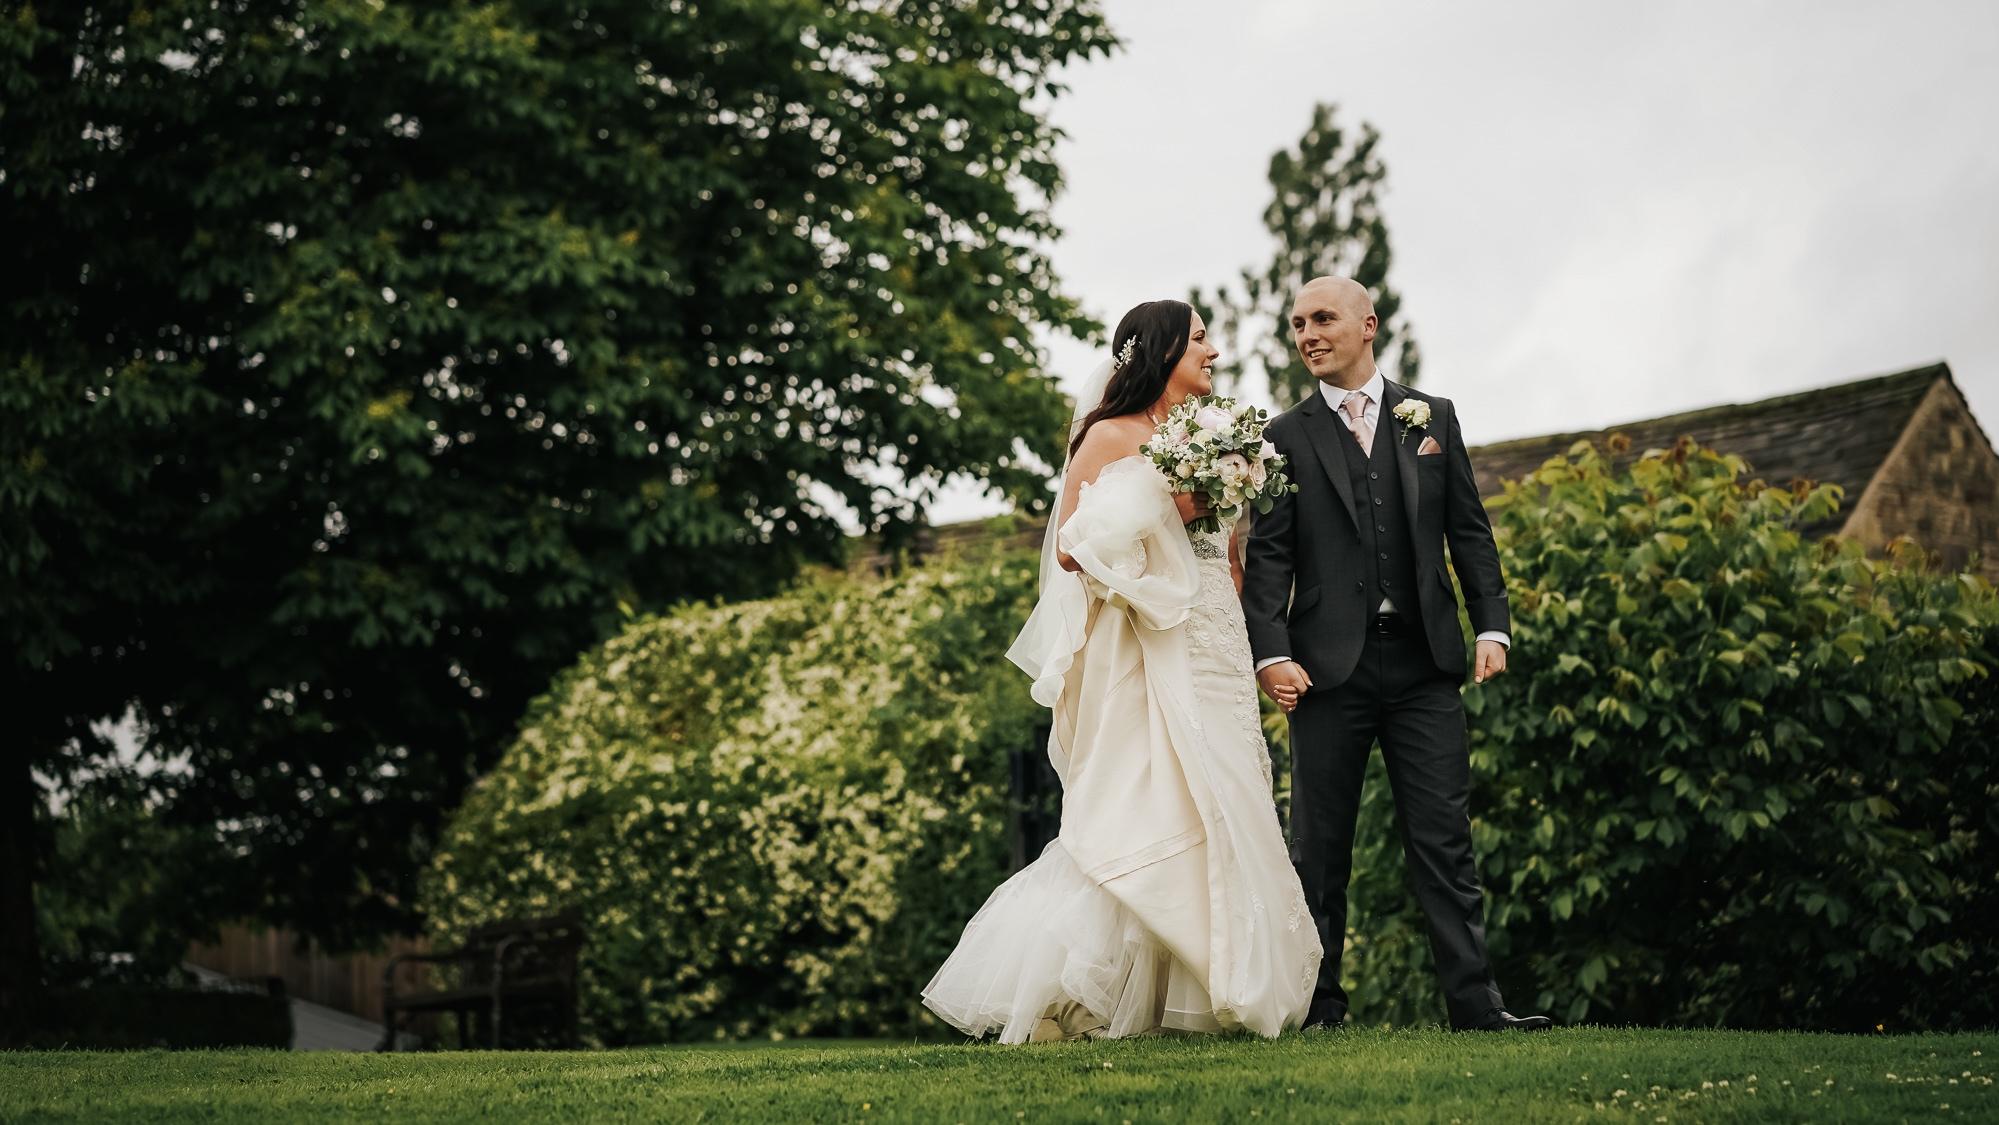 Hyde+Bank+Farm+Wedding+Photography+Manchester+wedding+photographer+%2841+of+49%29.jpg